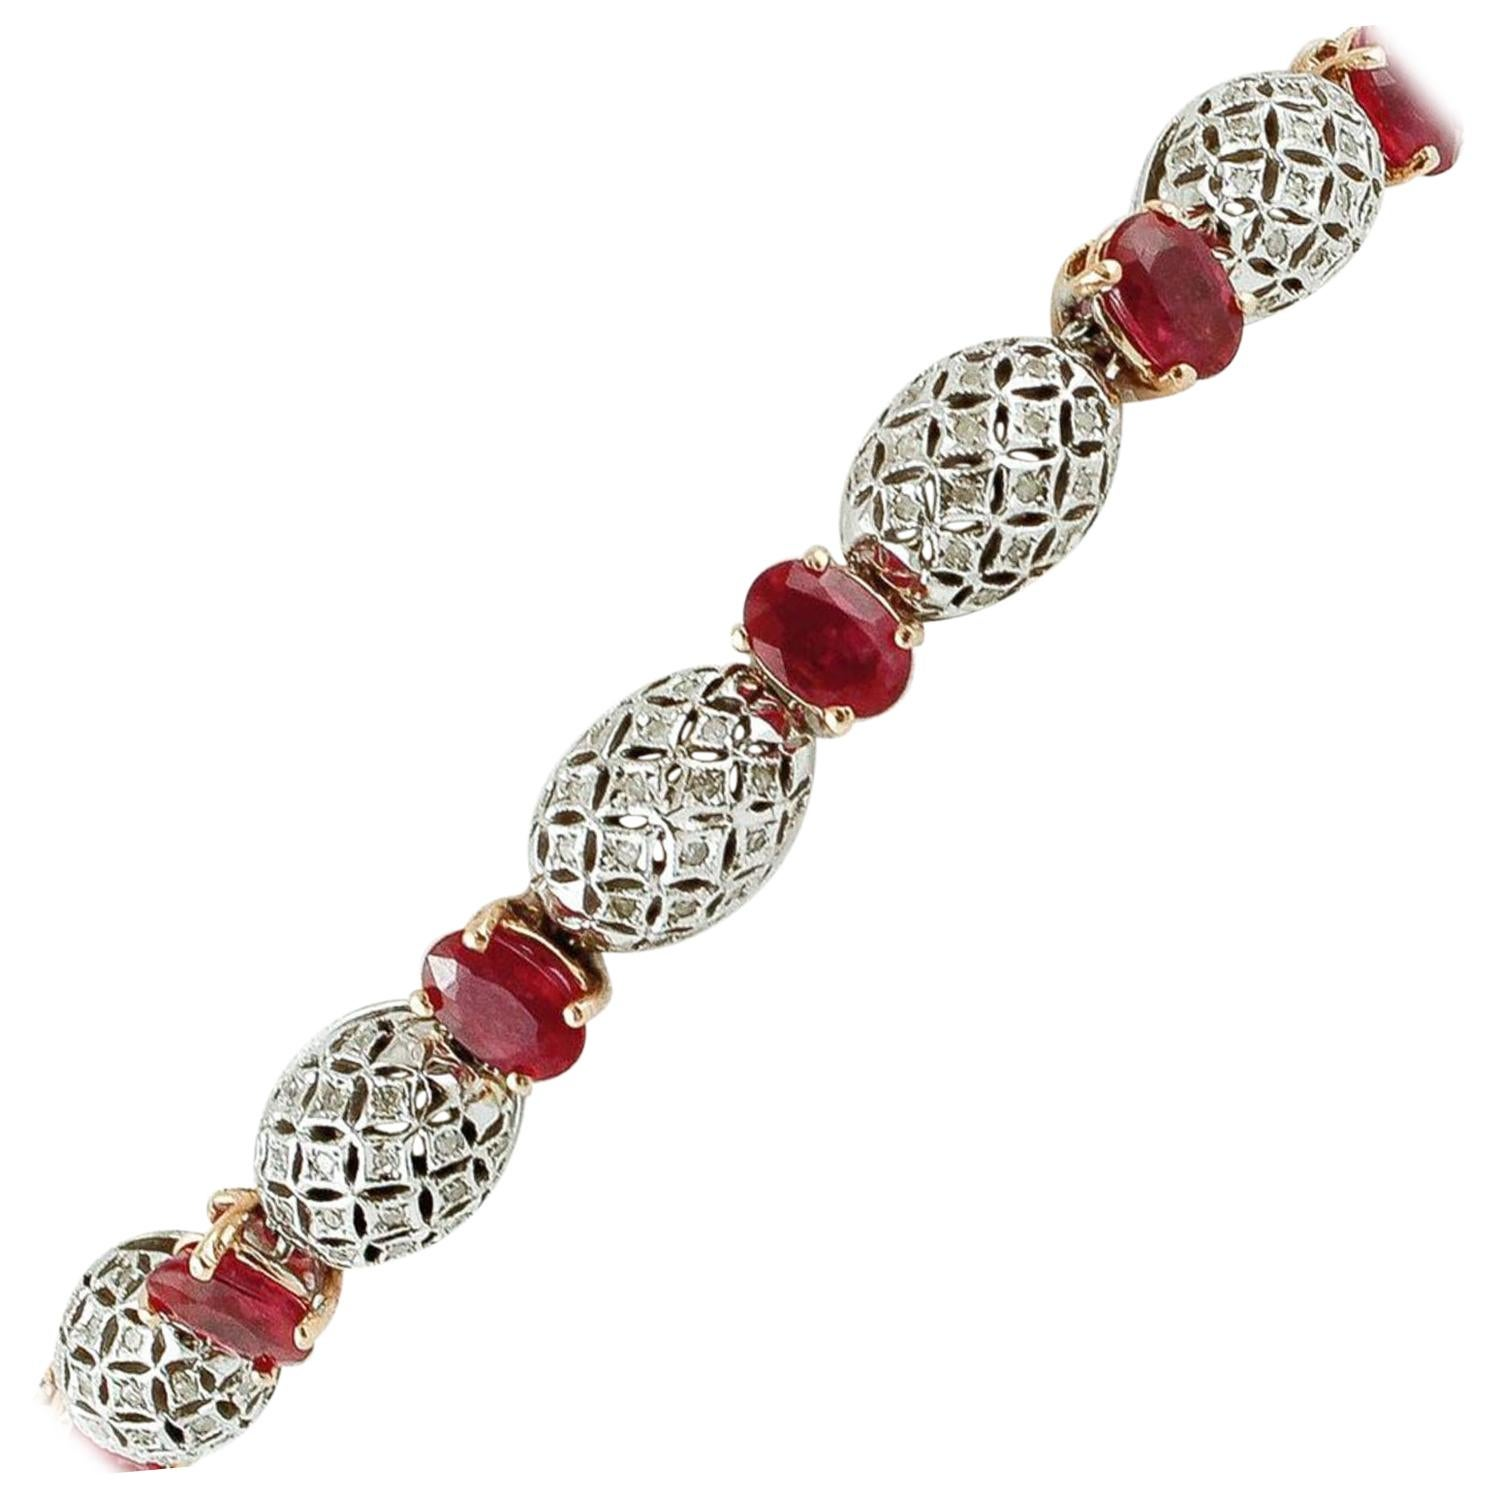 Handcrafted Bracelet, Rubies, Diamonds, 14 Karat White and Yellow Gold Bracelet